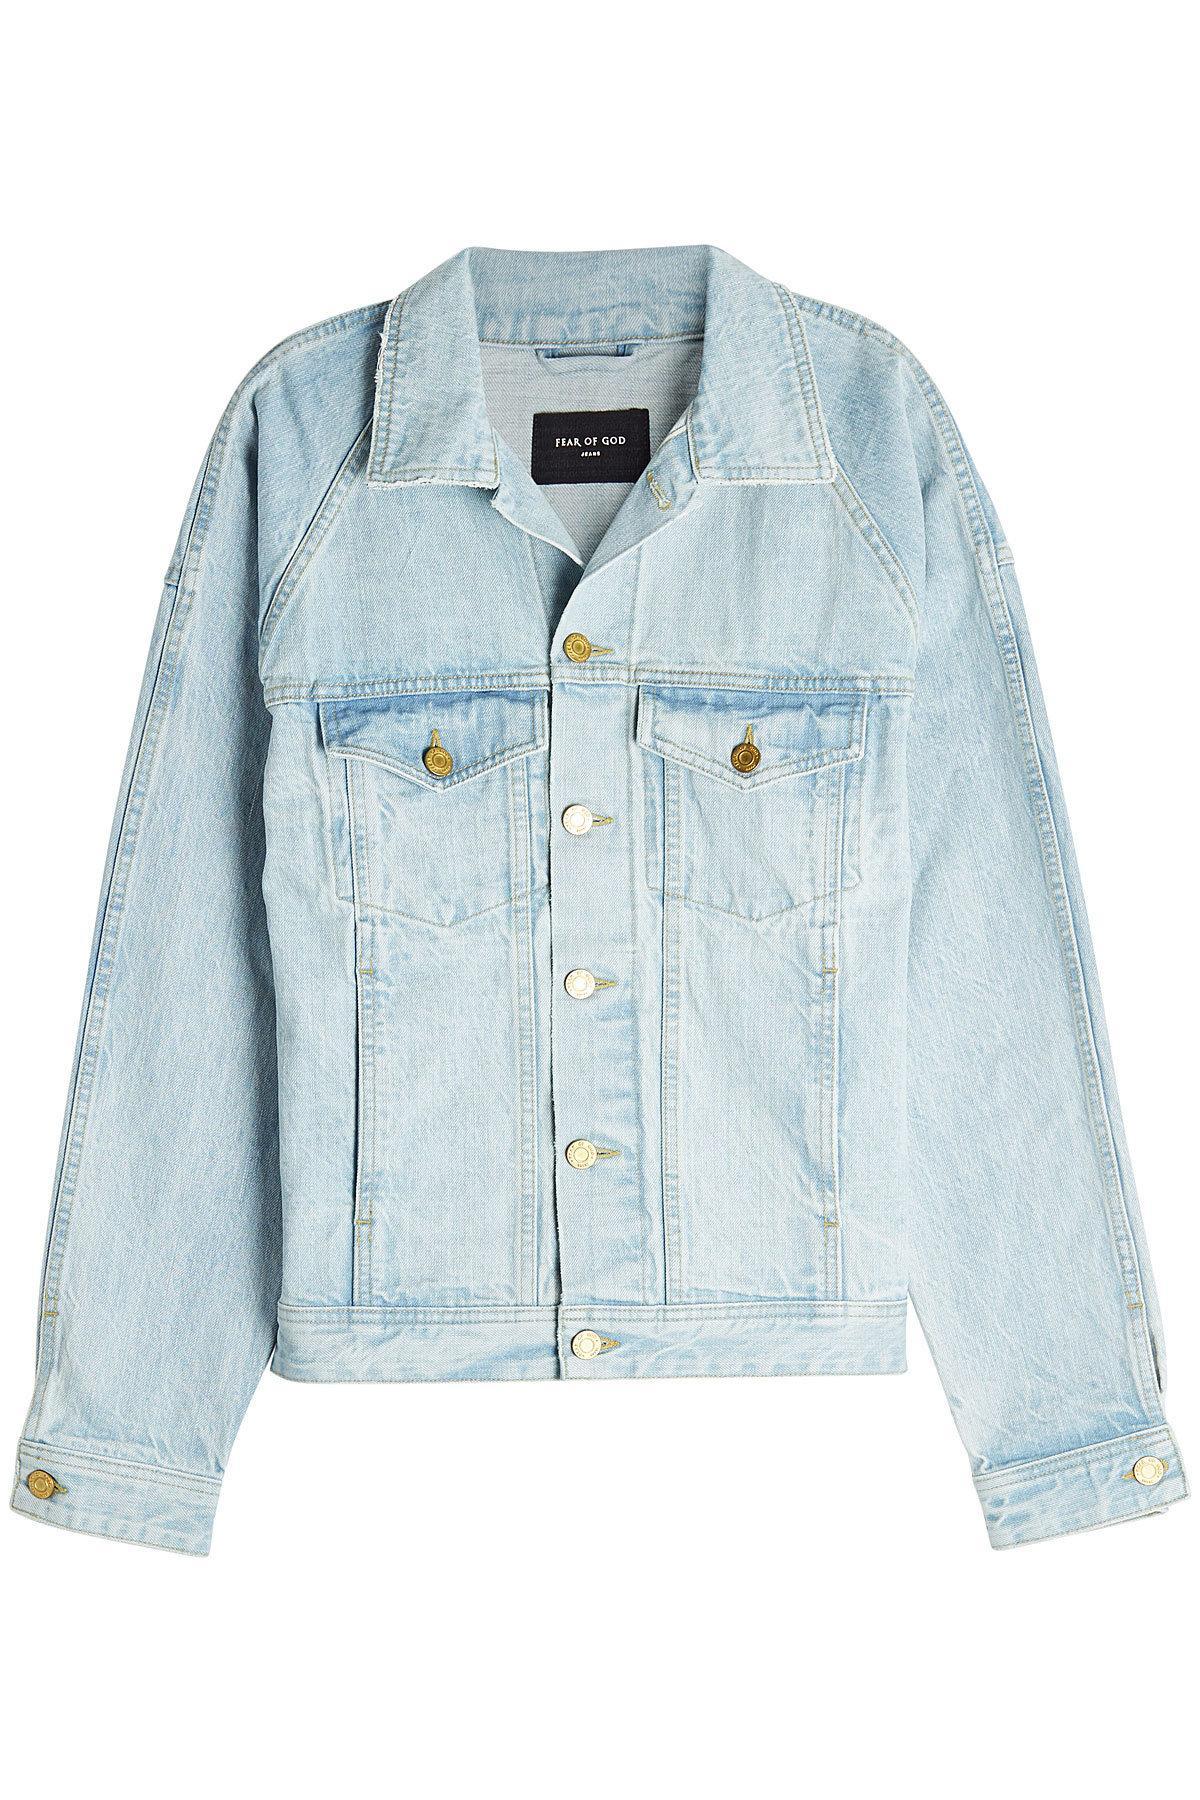 Fear Of God Denim Jacket In Blue